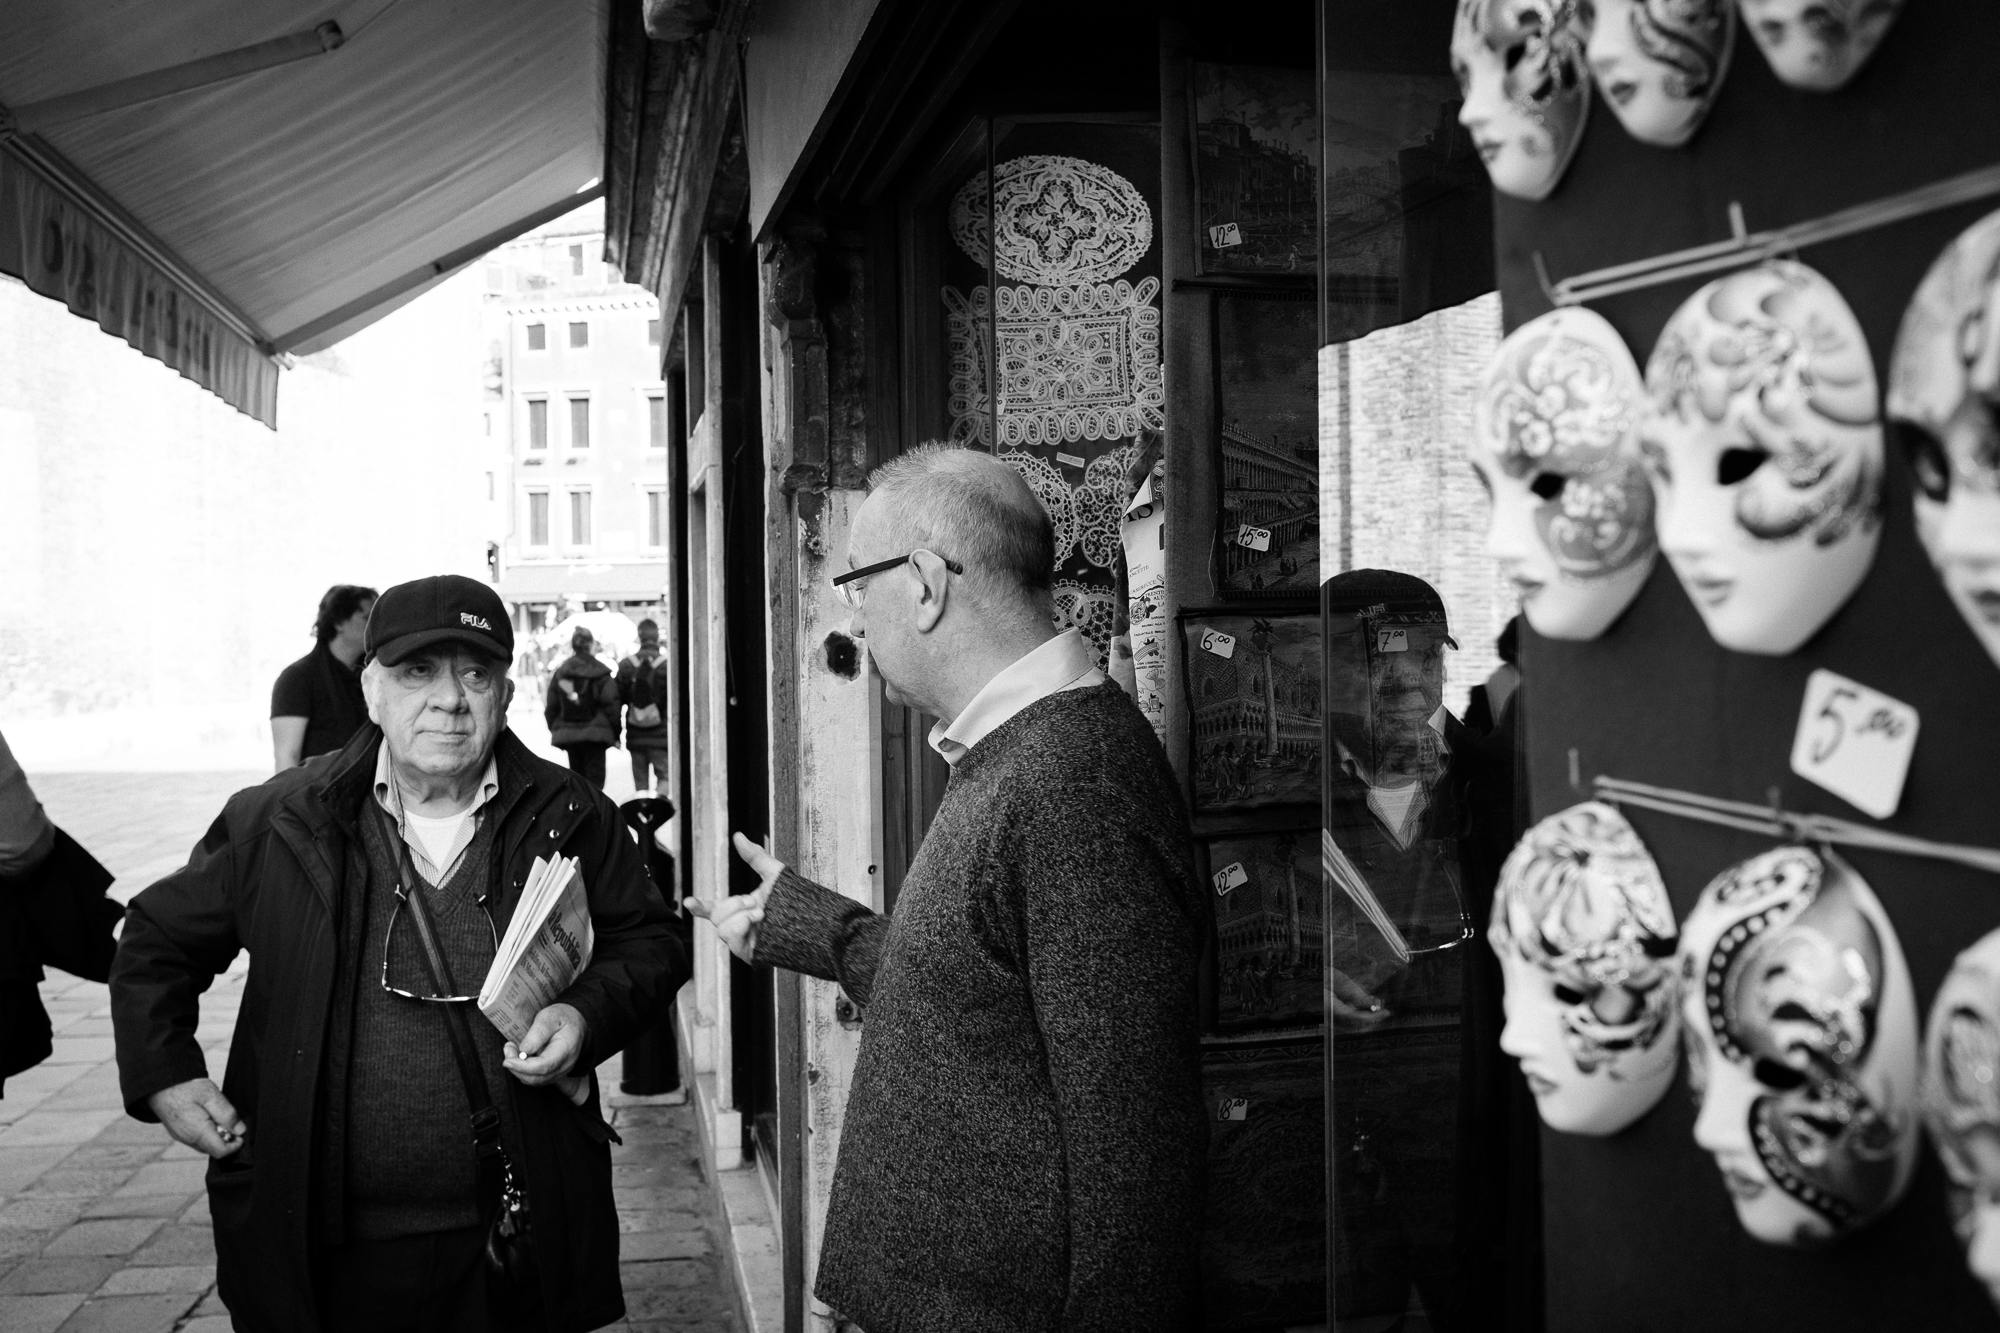 Two elderly gentleman having a conversation in Venice, Italy